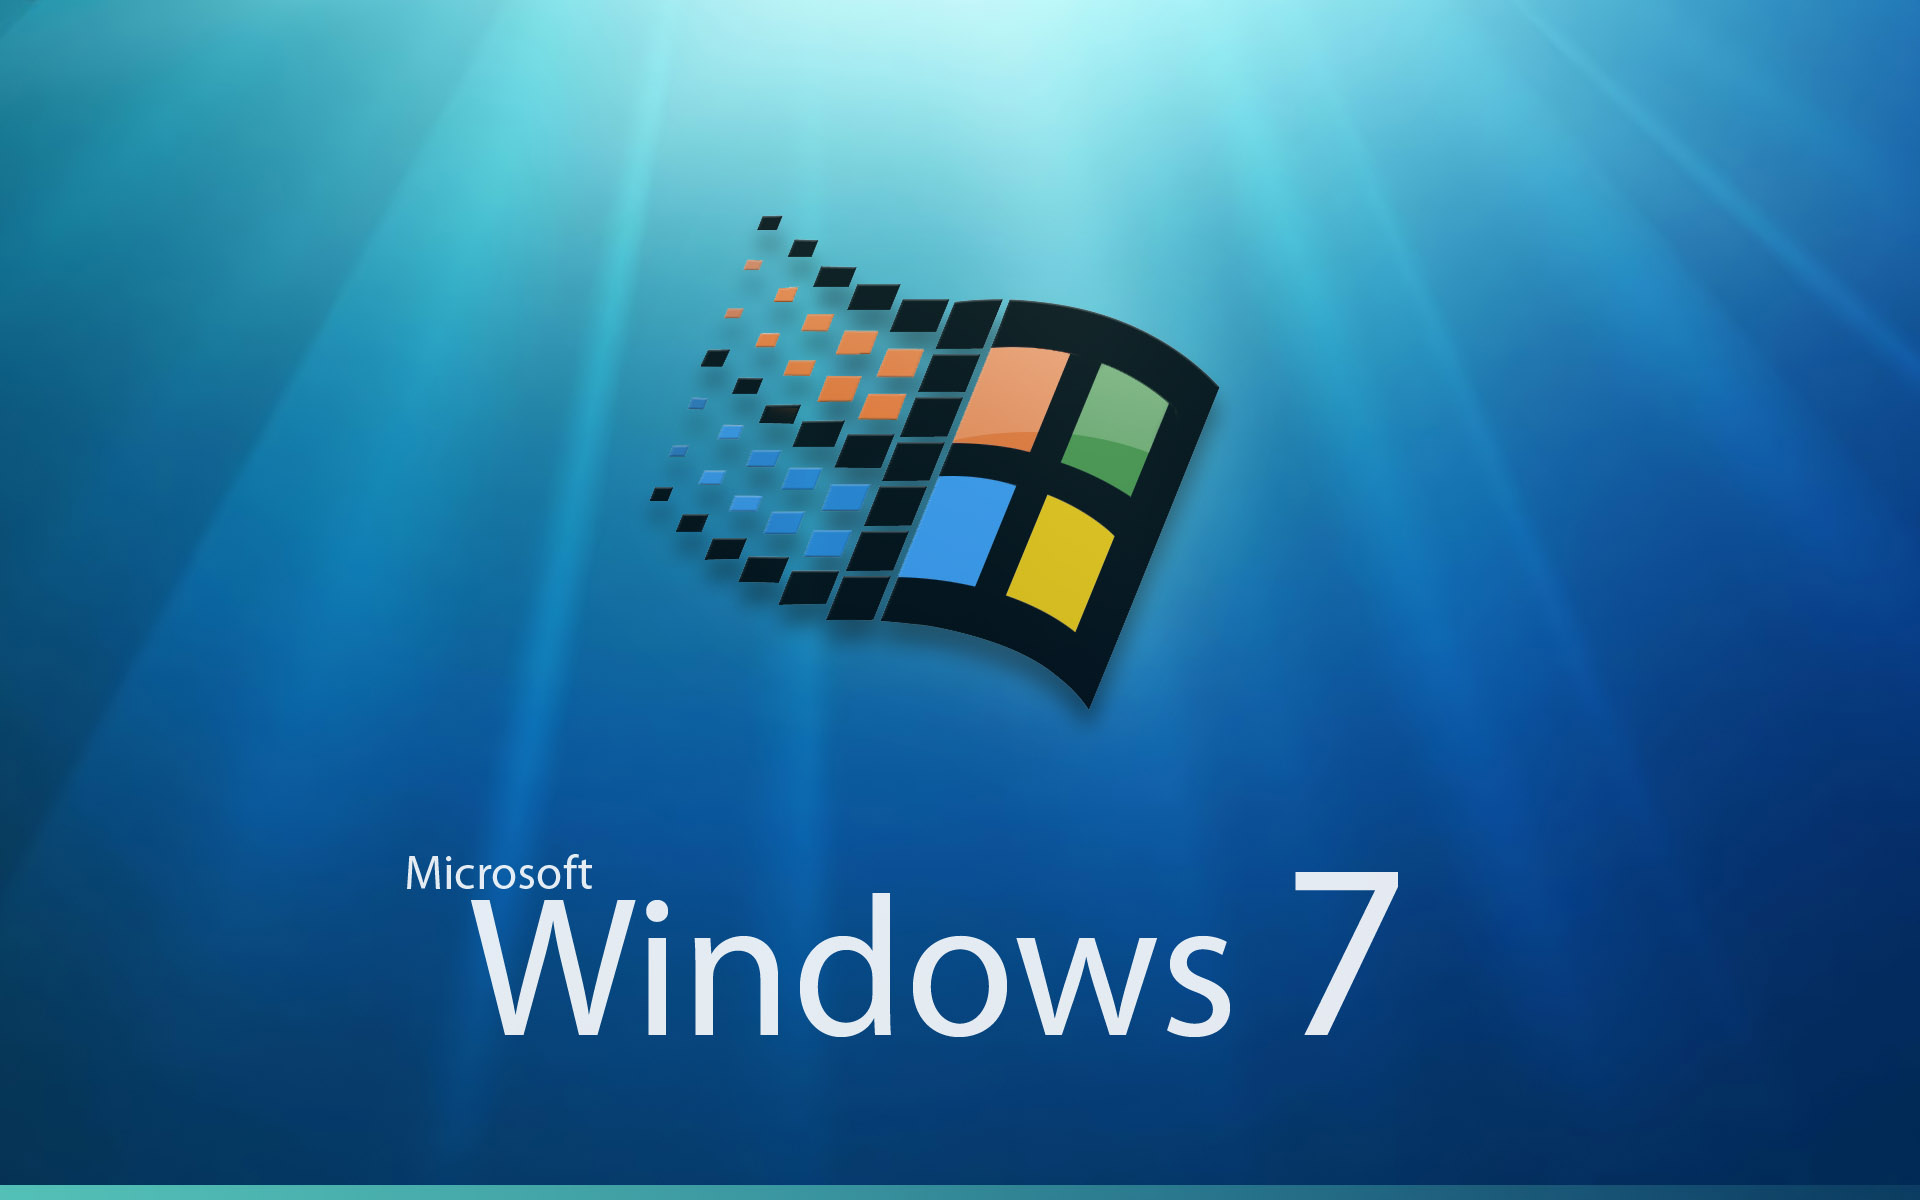 Microsoft Windows 7 Logo free image